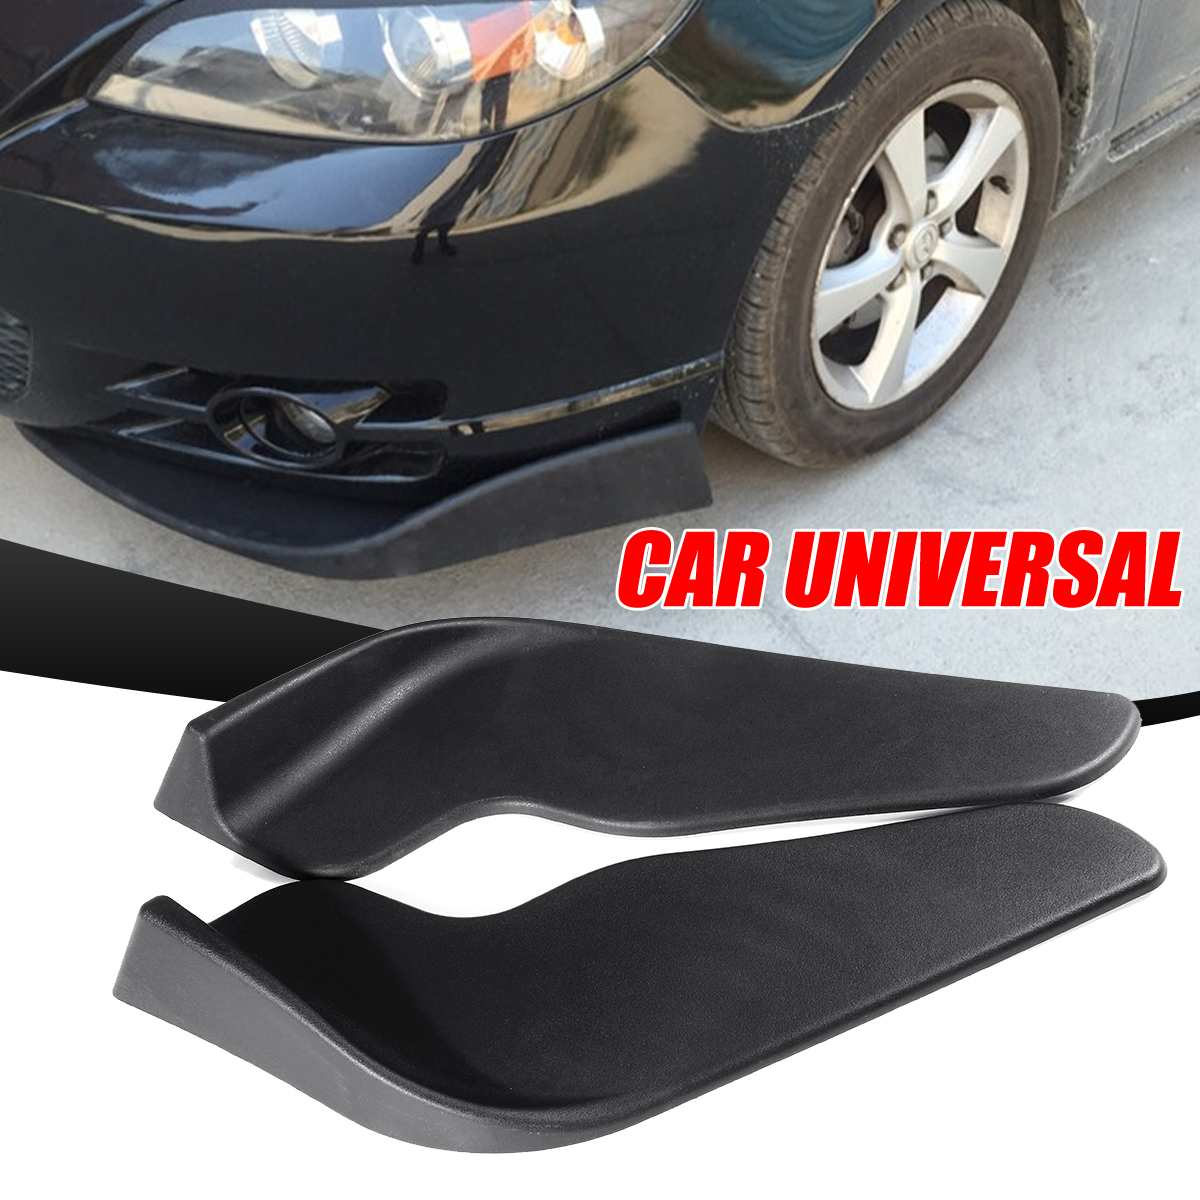 Mofaner 1Pair Universal Car Front Deflector Spoiler Splitter Diffuser Bumper Canard Lip Body Shovels Bumper Splitters